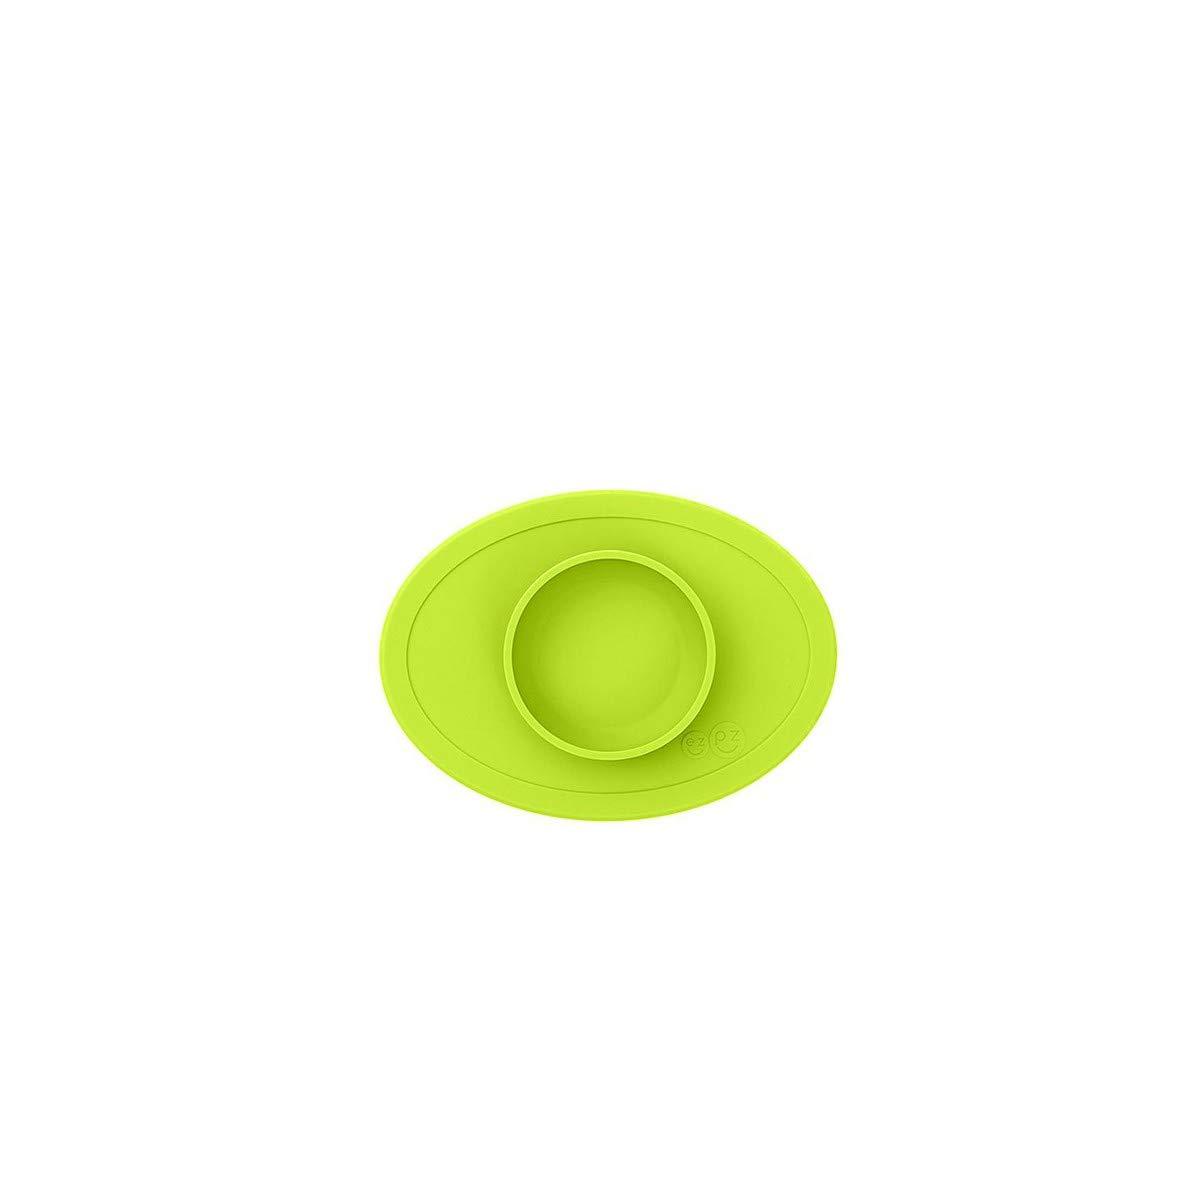 E-EUTBG001 EZPZ Vajilla infantil de silicona Tiny Bowl lima